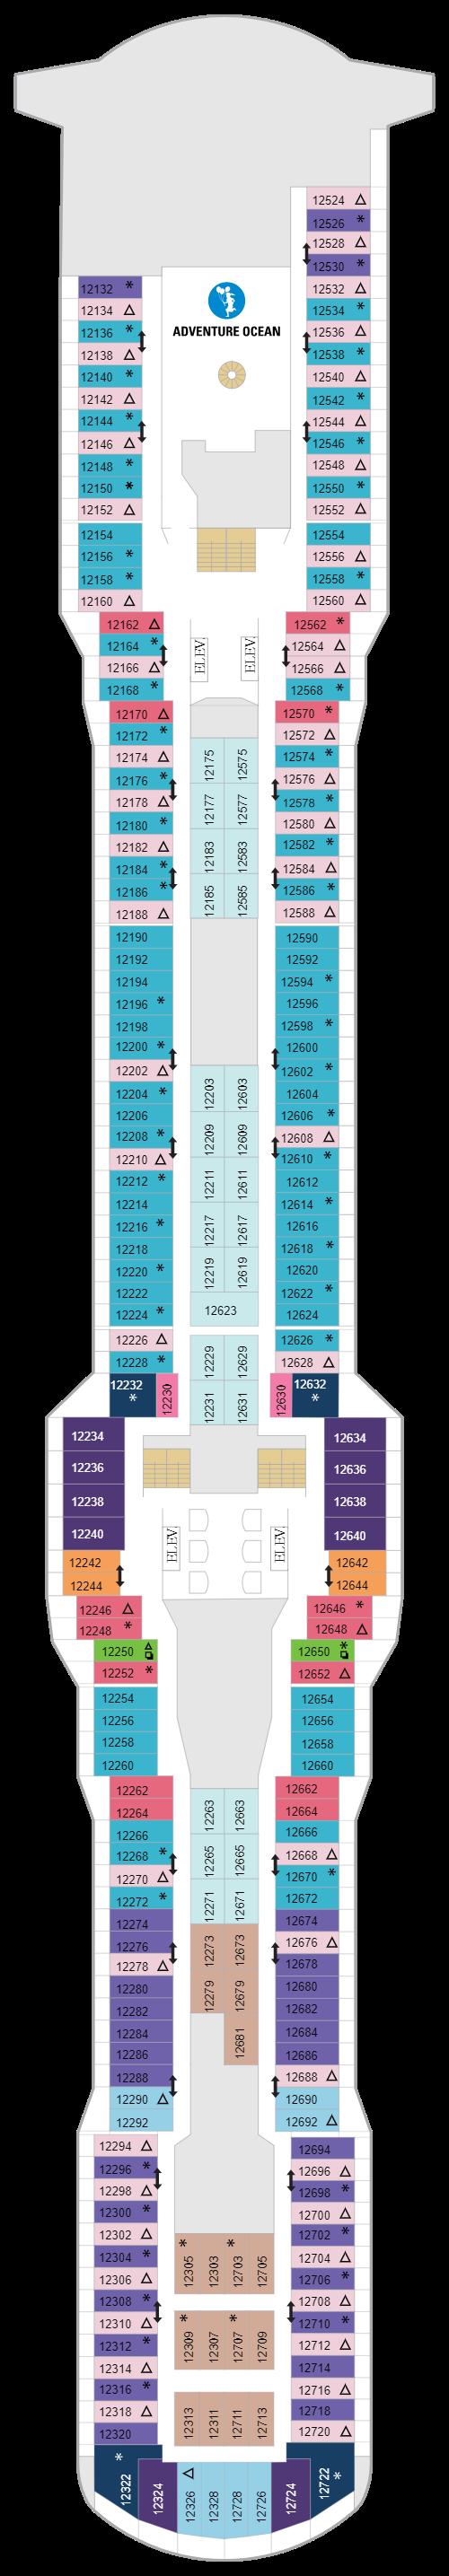 Deck 12 (January 24th, 2021 - Jan12th, 2022)